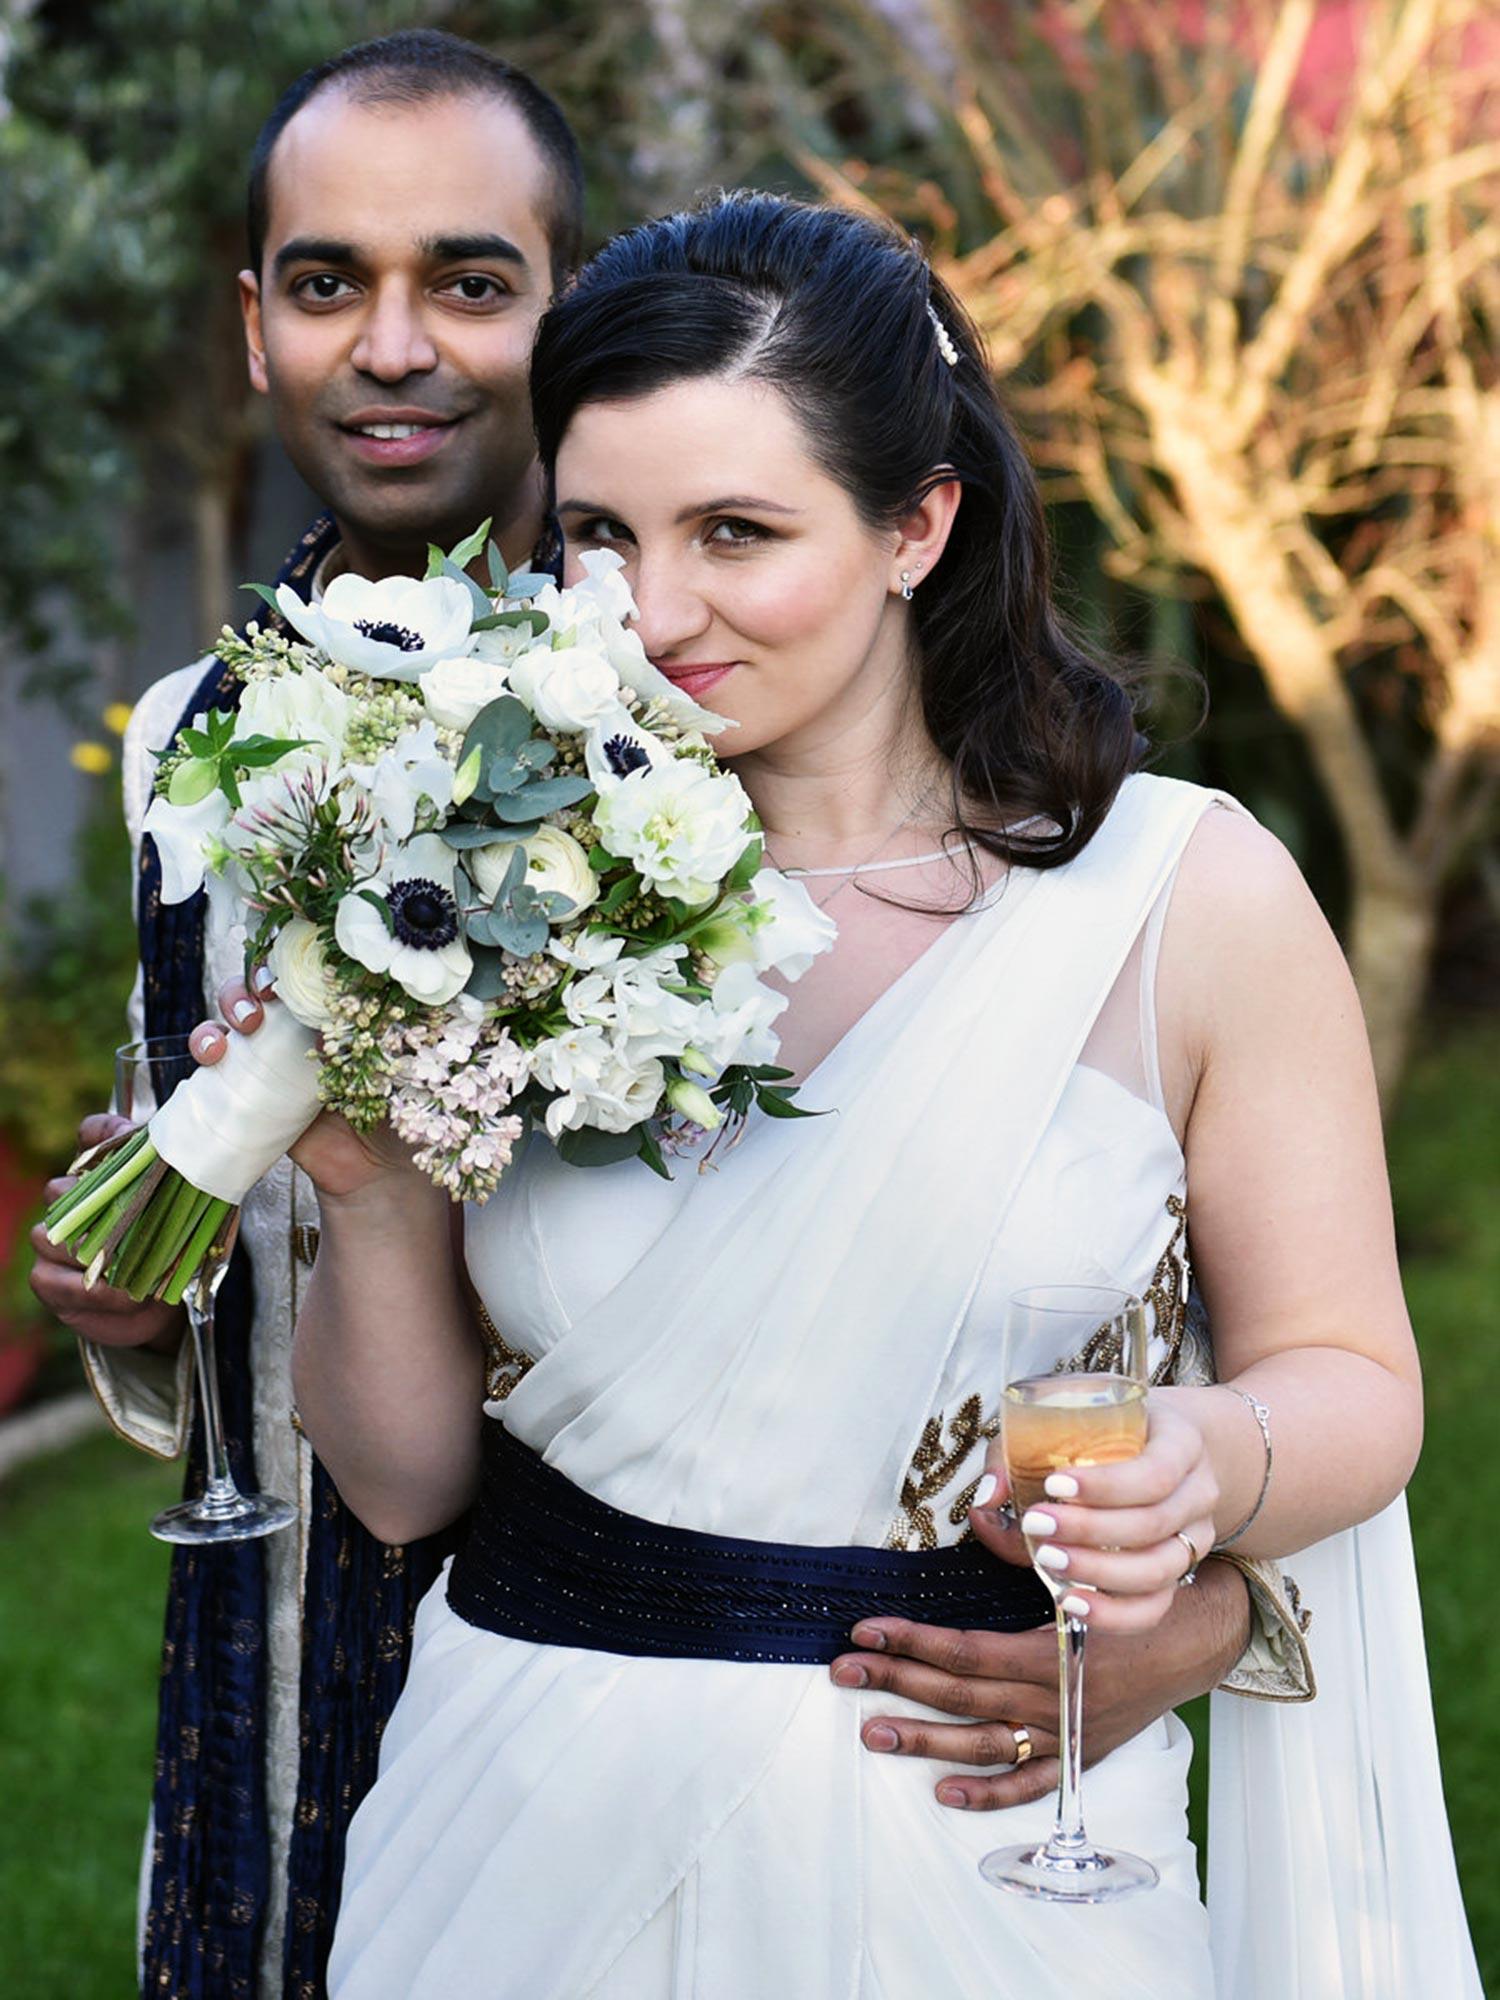 Kensington Roof Gardens, London Wedding